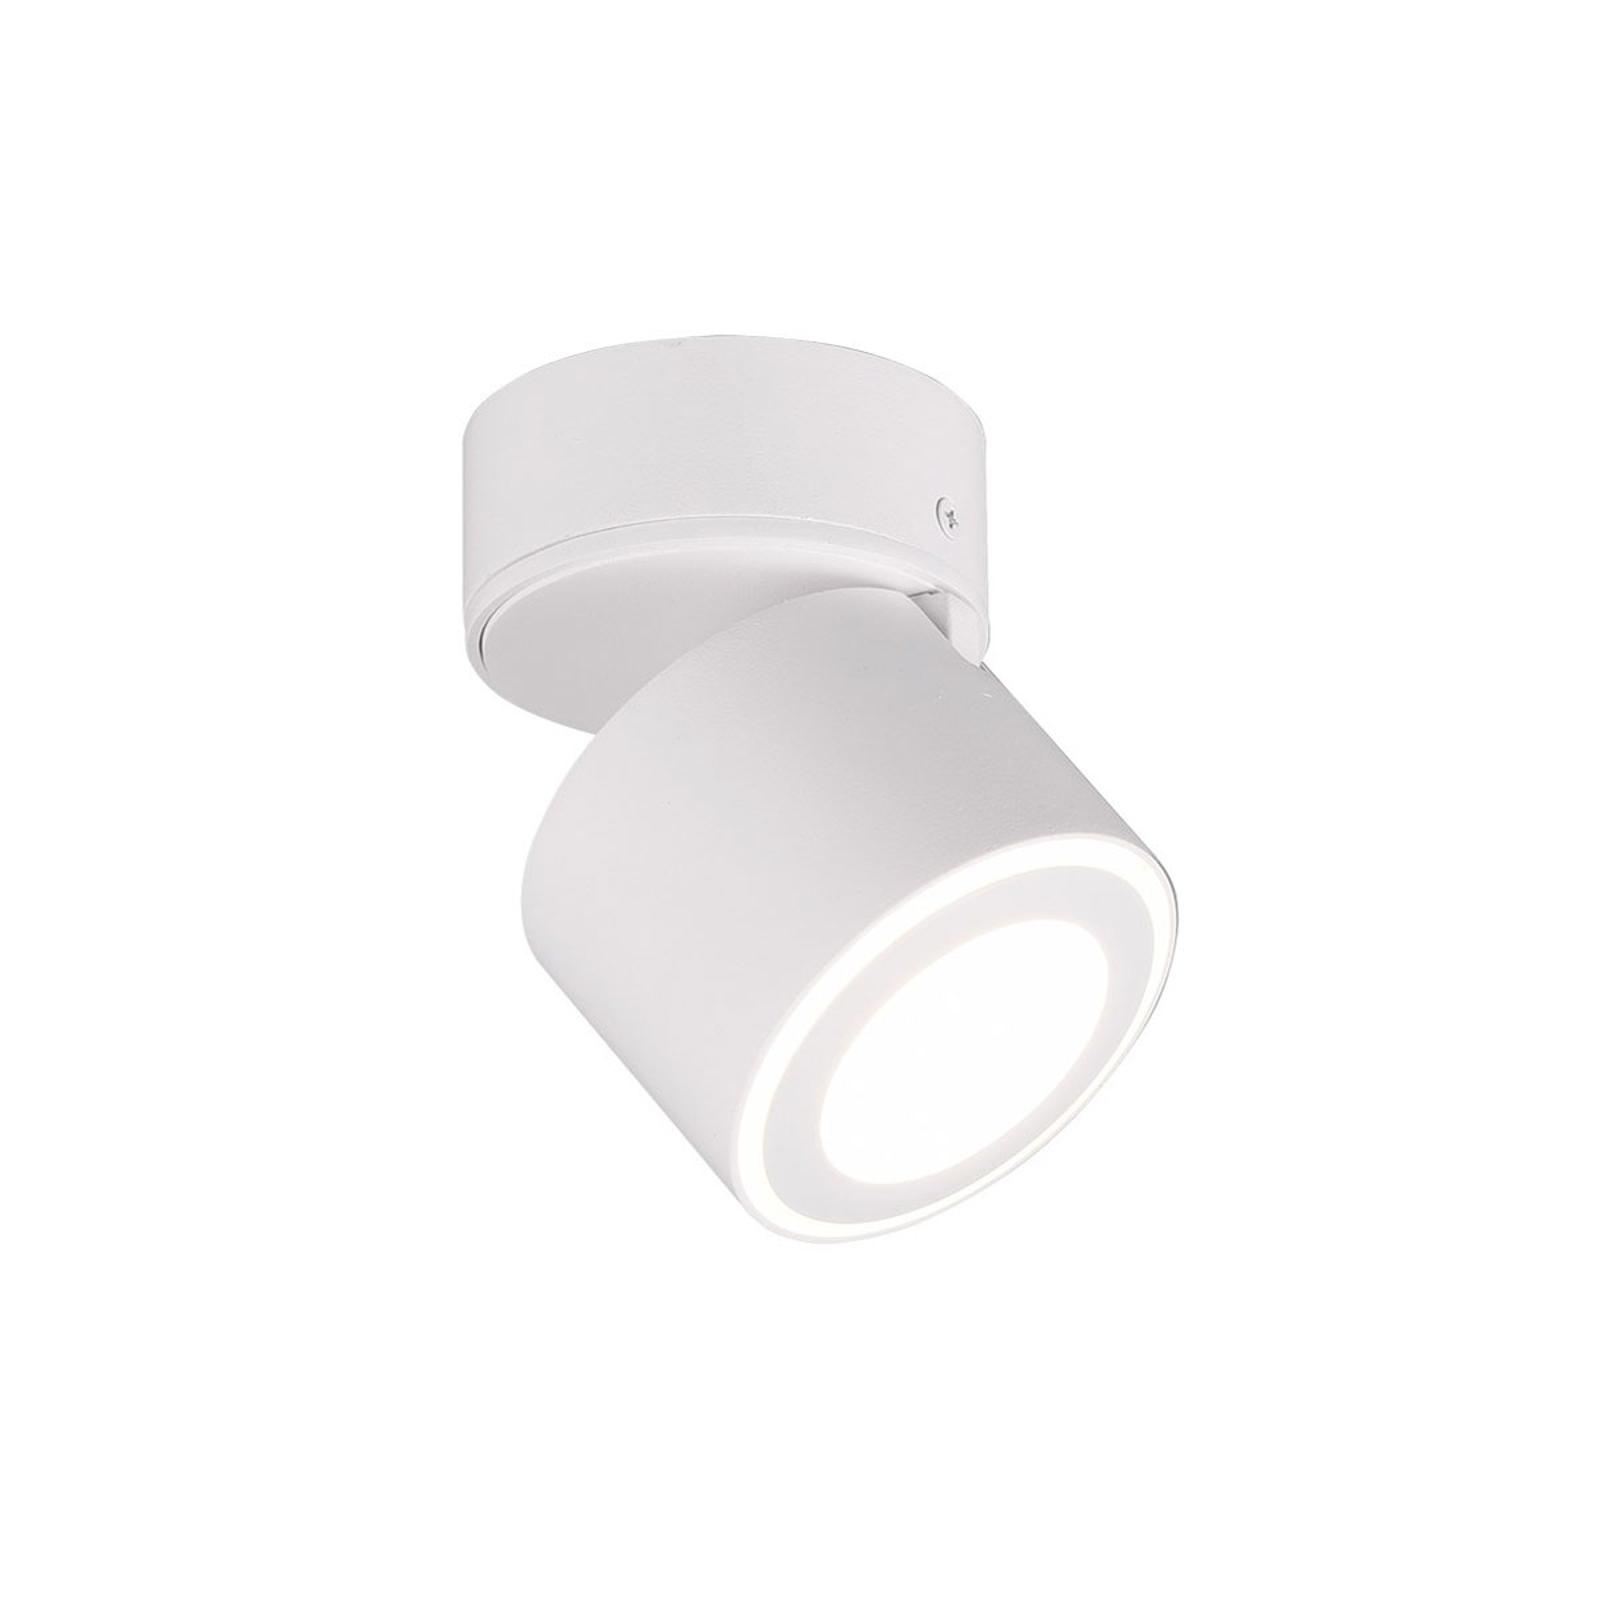 Lindby Lowie LED-spotlight, 2 lampor, vit